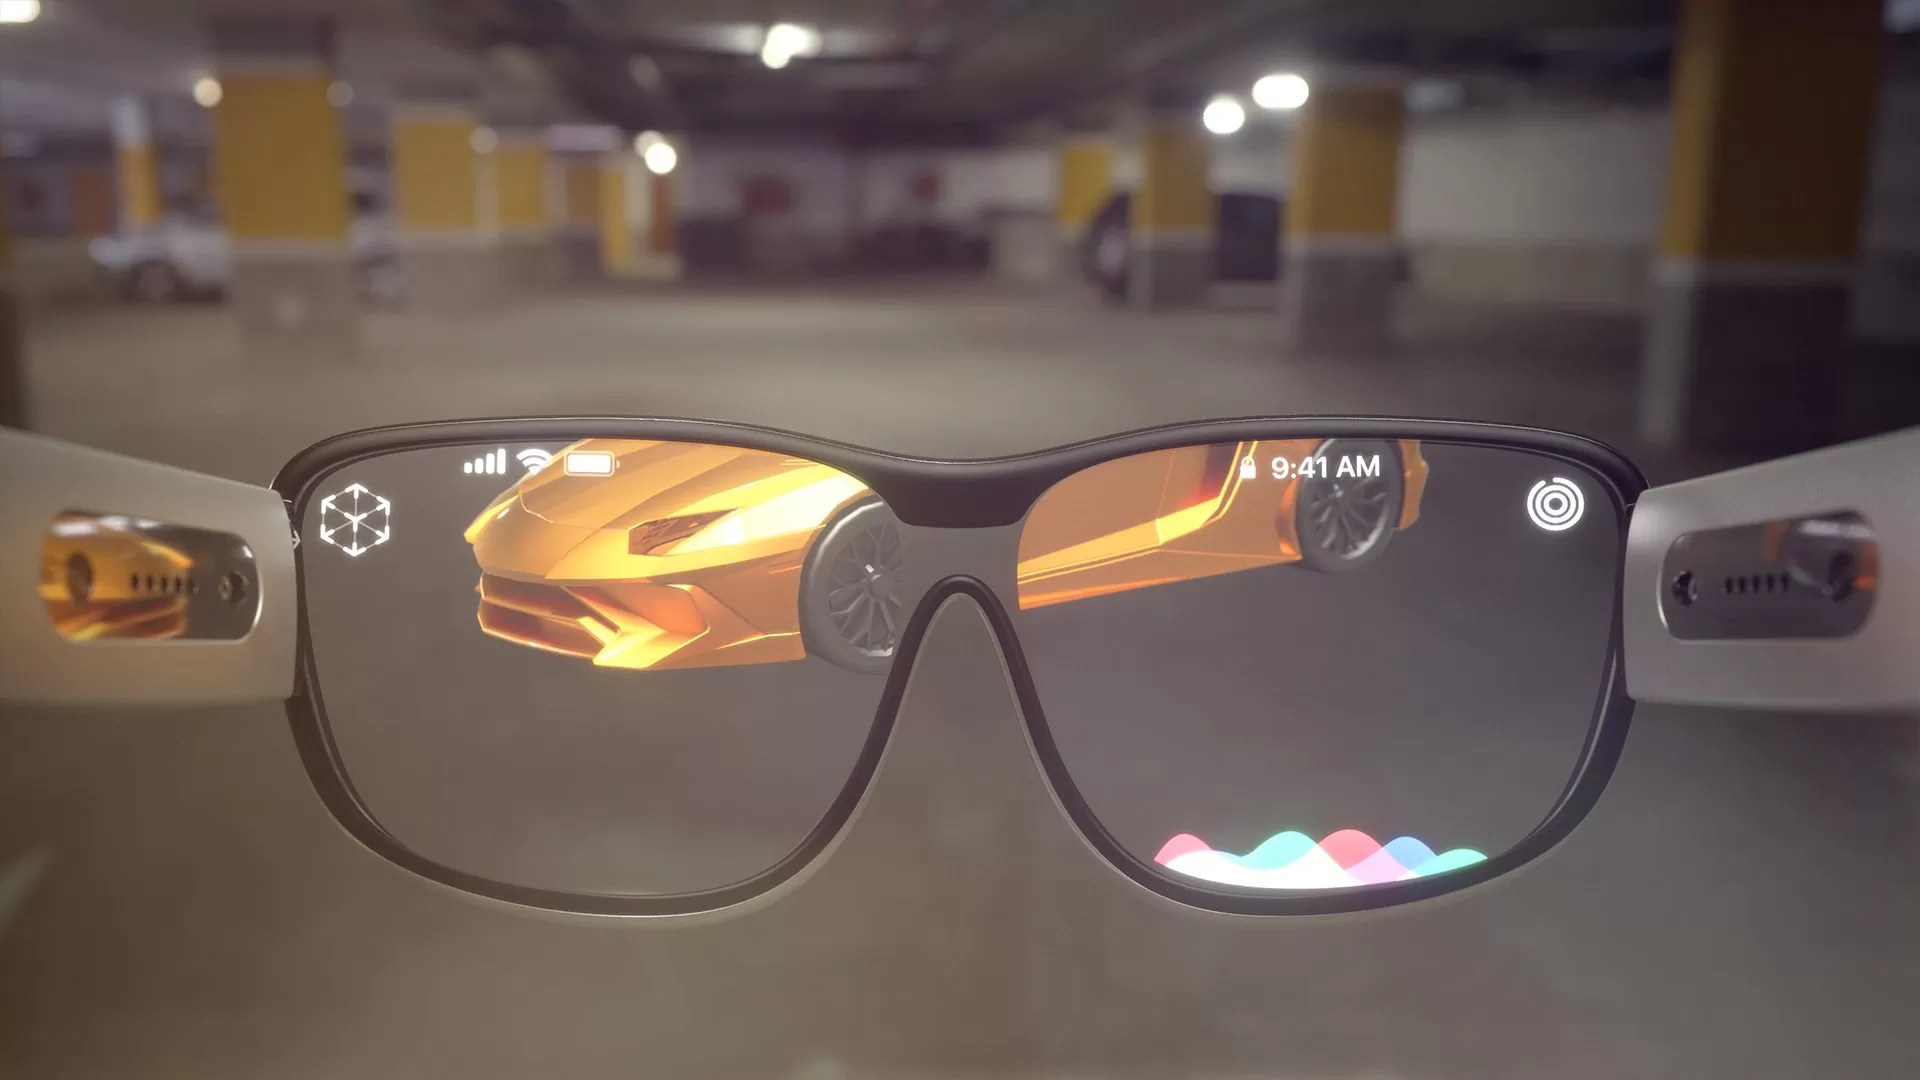 Protótipo dos Óculos de Realidade Aumentada da Apple